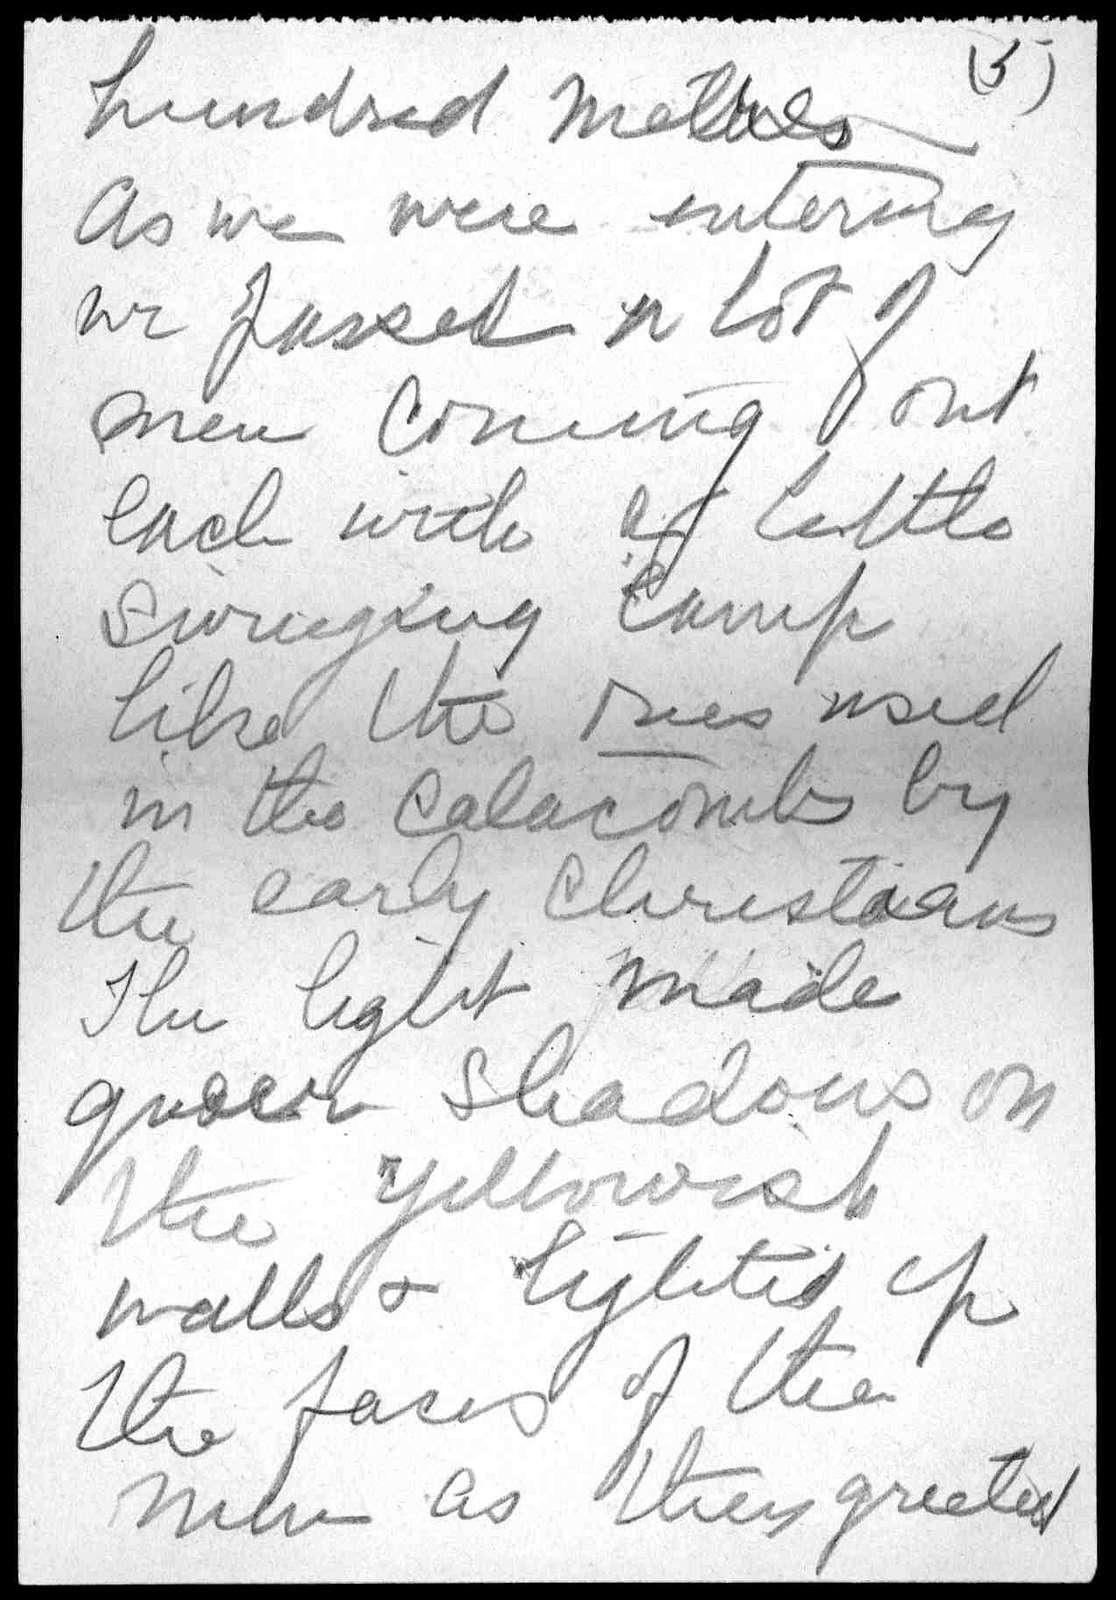 Letter from Marian Bell Fairchild to Alexander Graham Bell, April 23, 1901